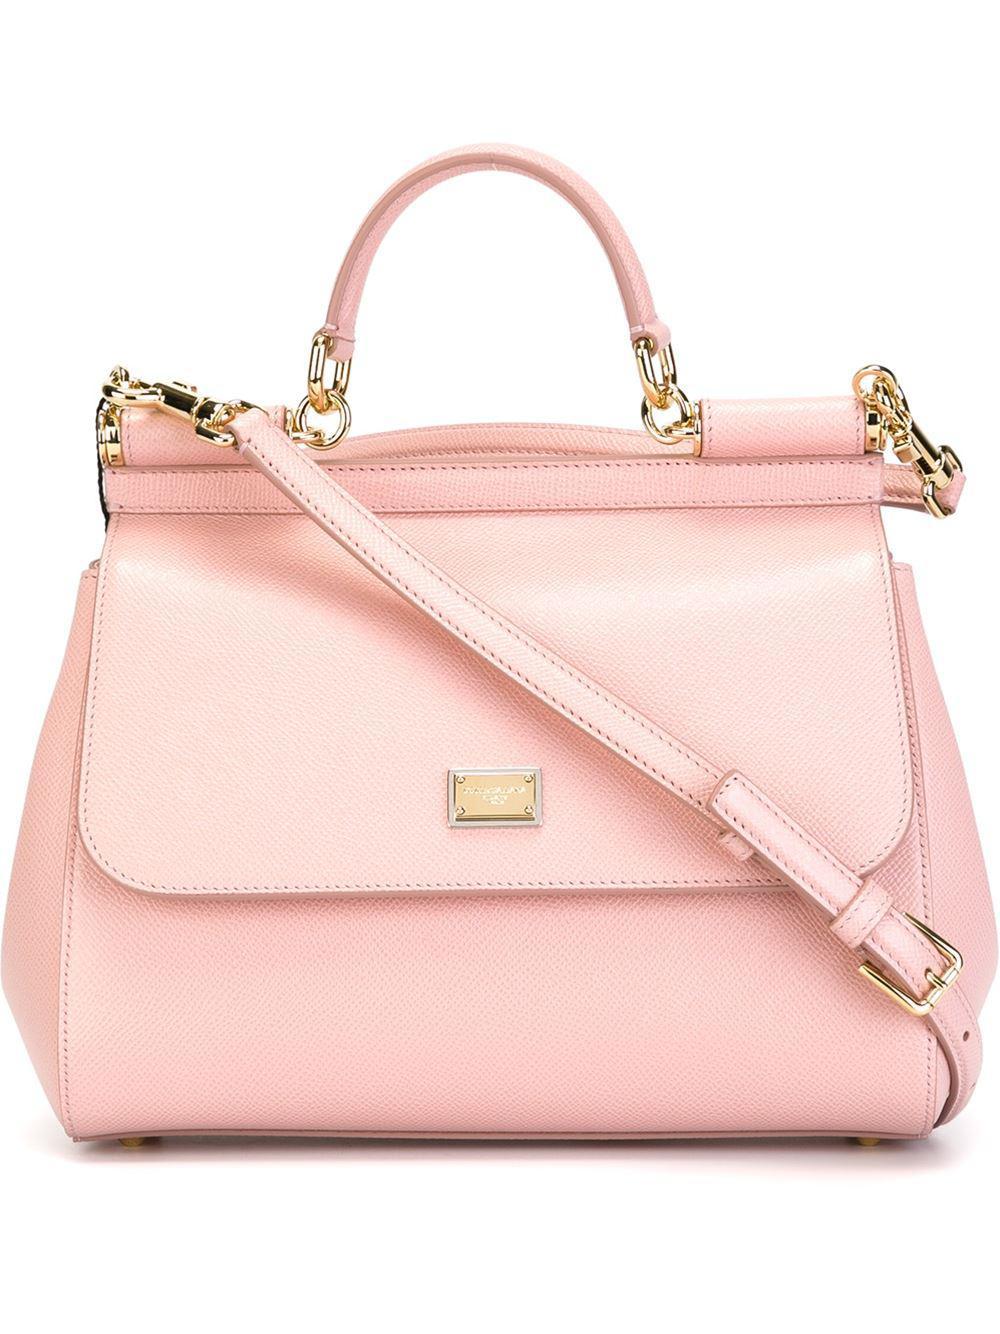 084c28a8425e Lyst - Dolce   Gabbana St.dauphine Handbag in Pink